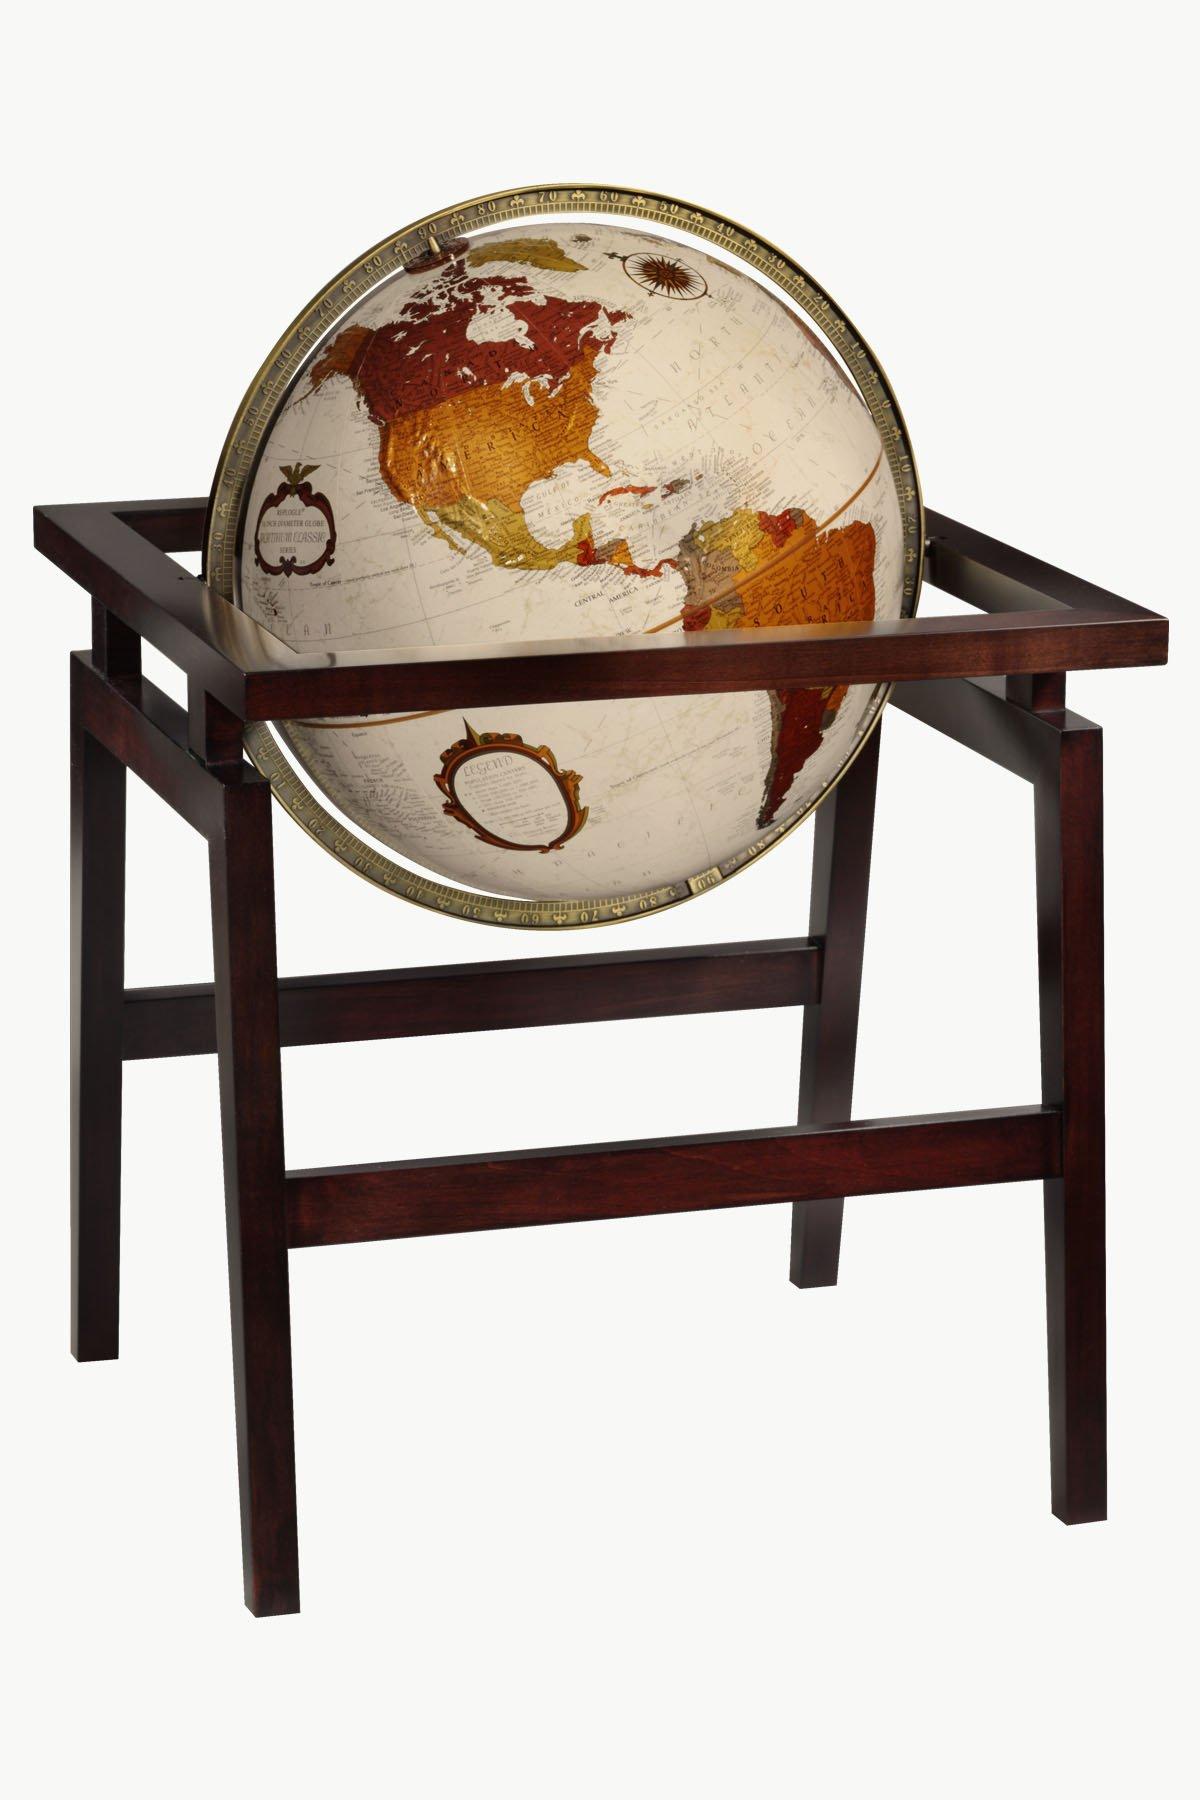 Replogle Madison Floor Model Bronze Metallic Raised Relief with Dark Mocha Hardwood Stand World Globe(16''/40cm diameter)